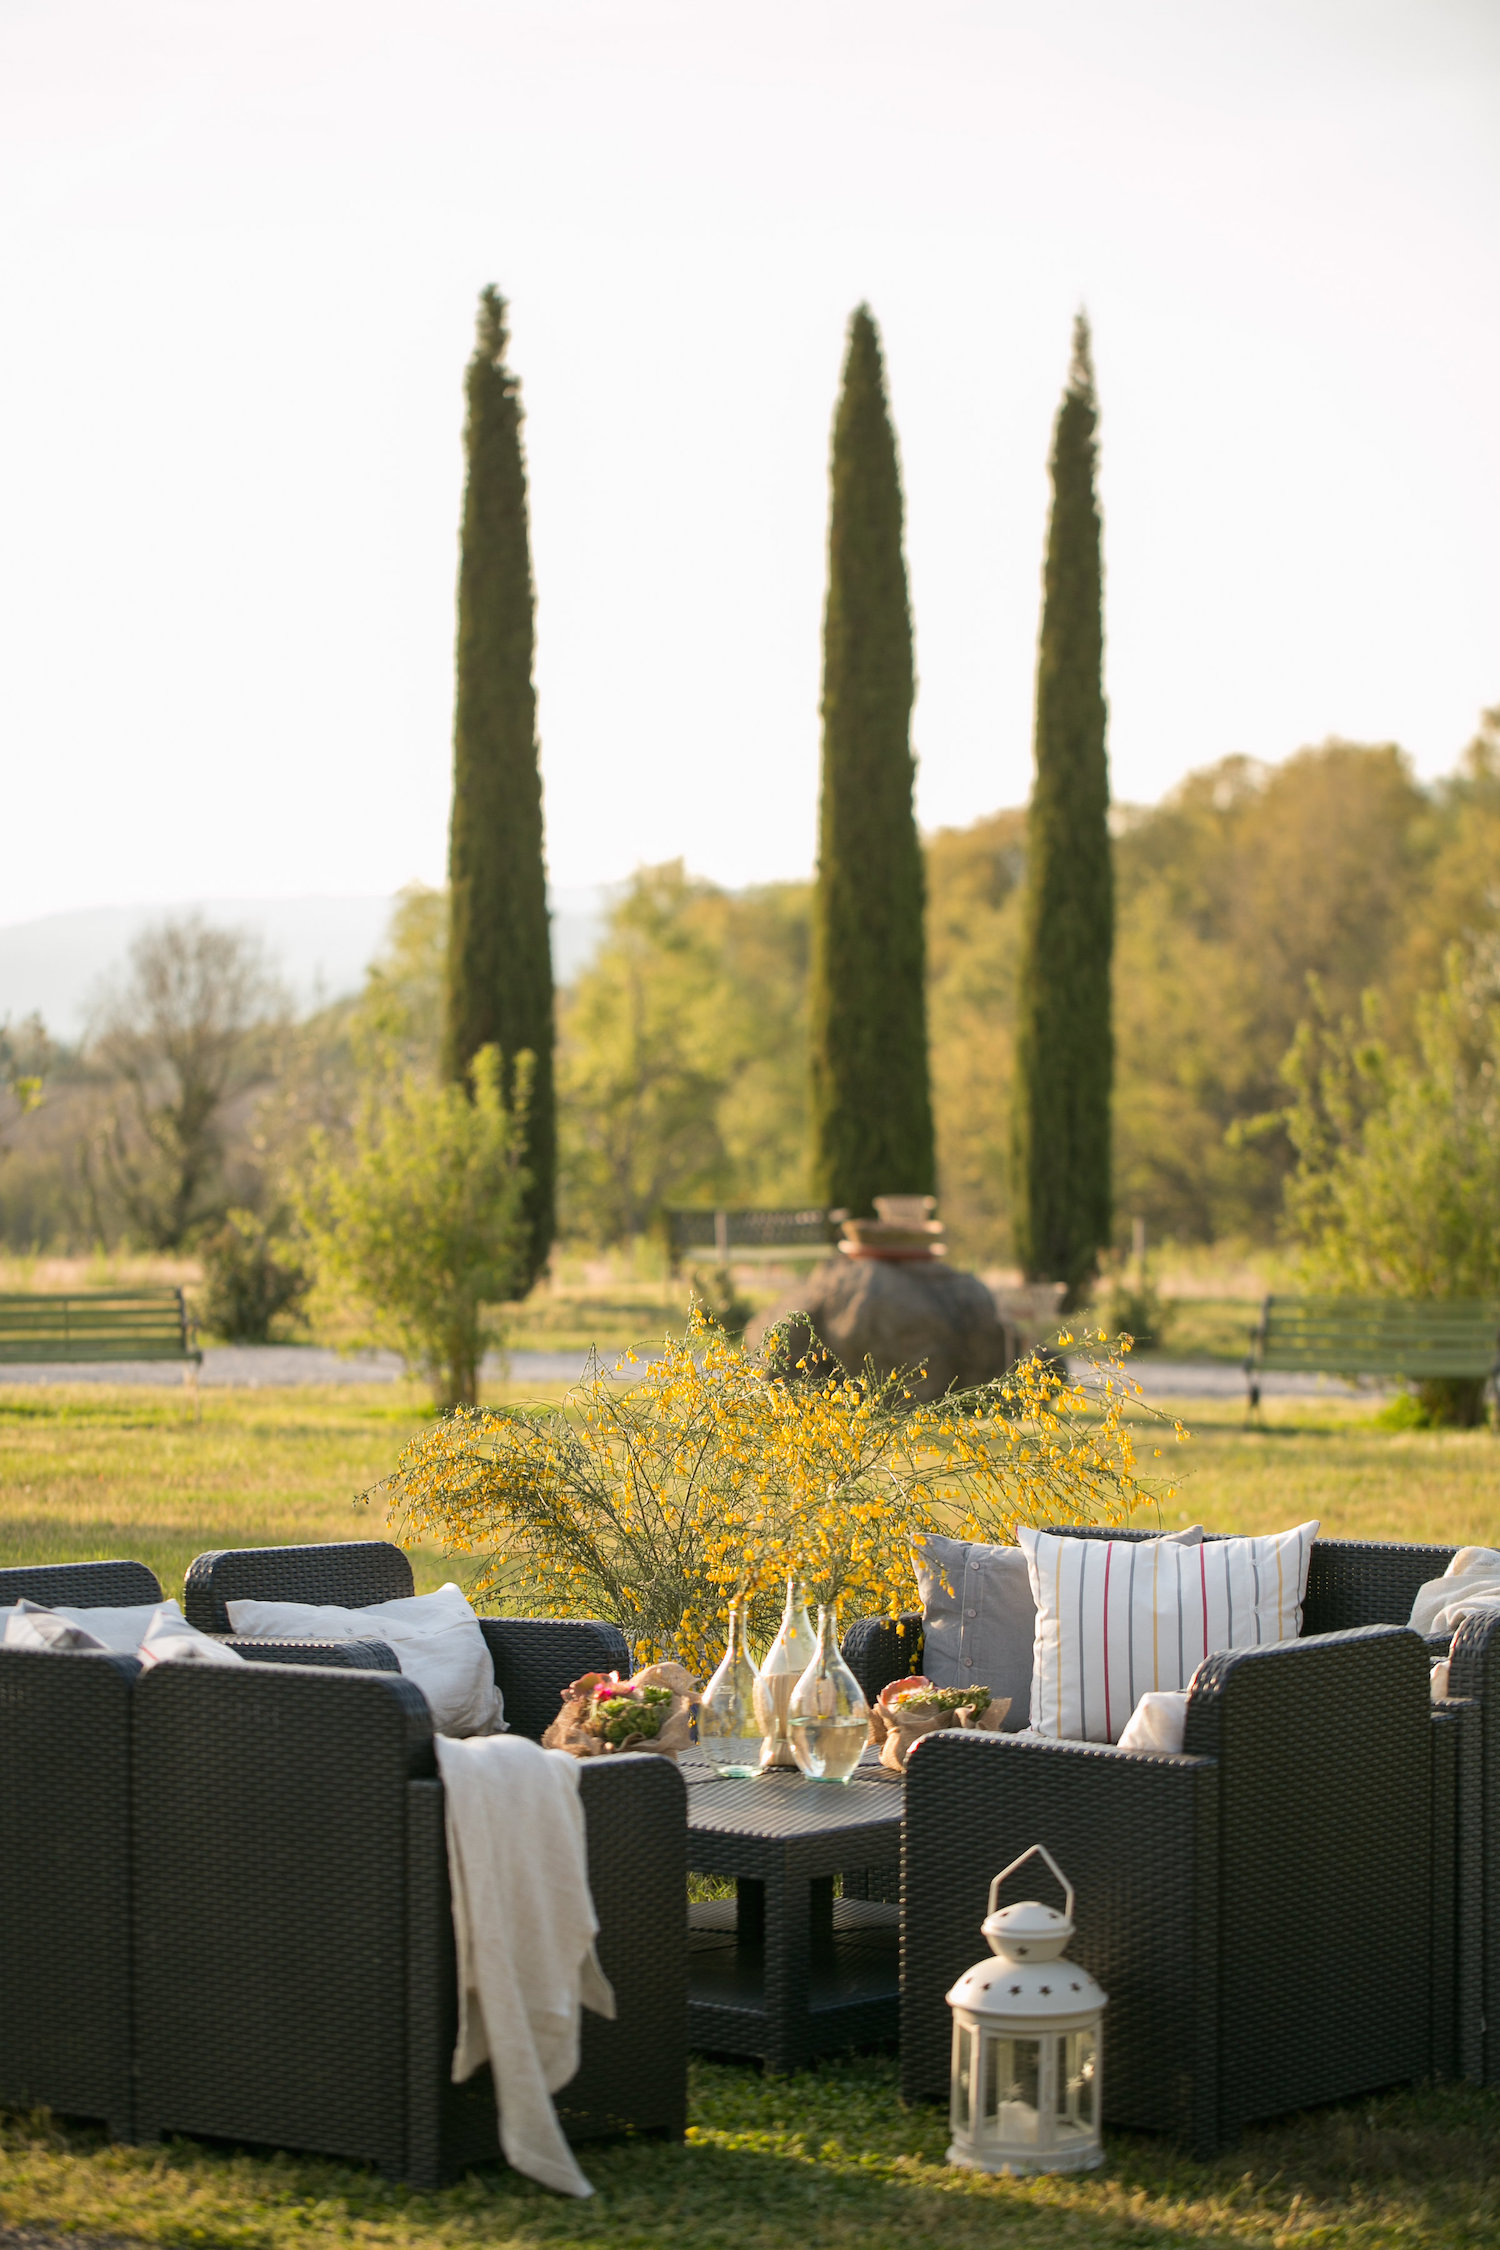 lawn_furniture_cyprus_trees.JPG